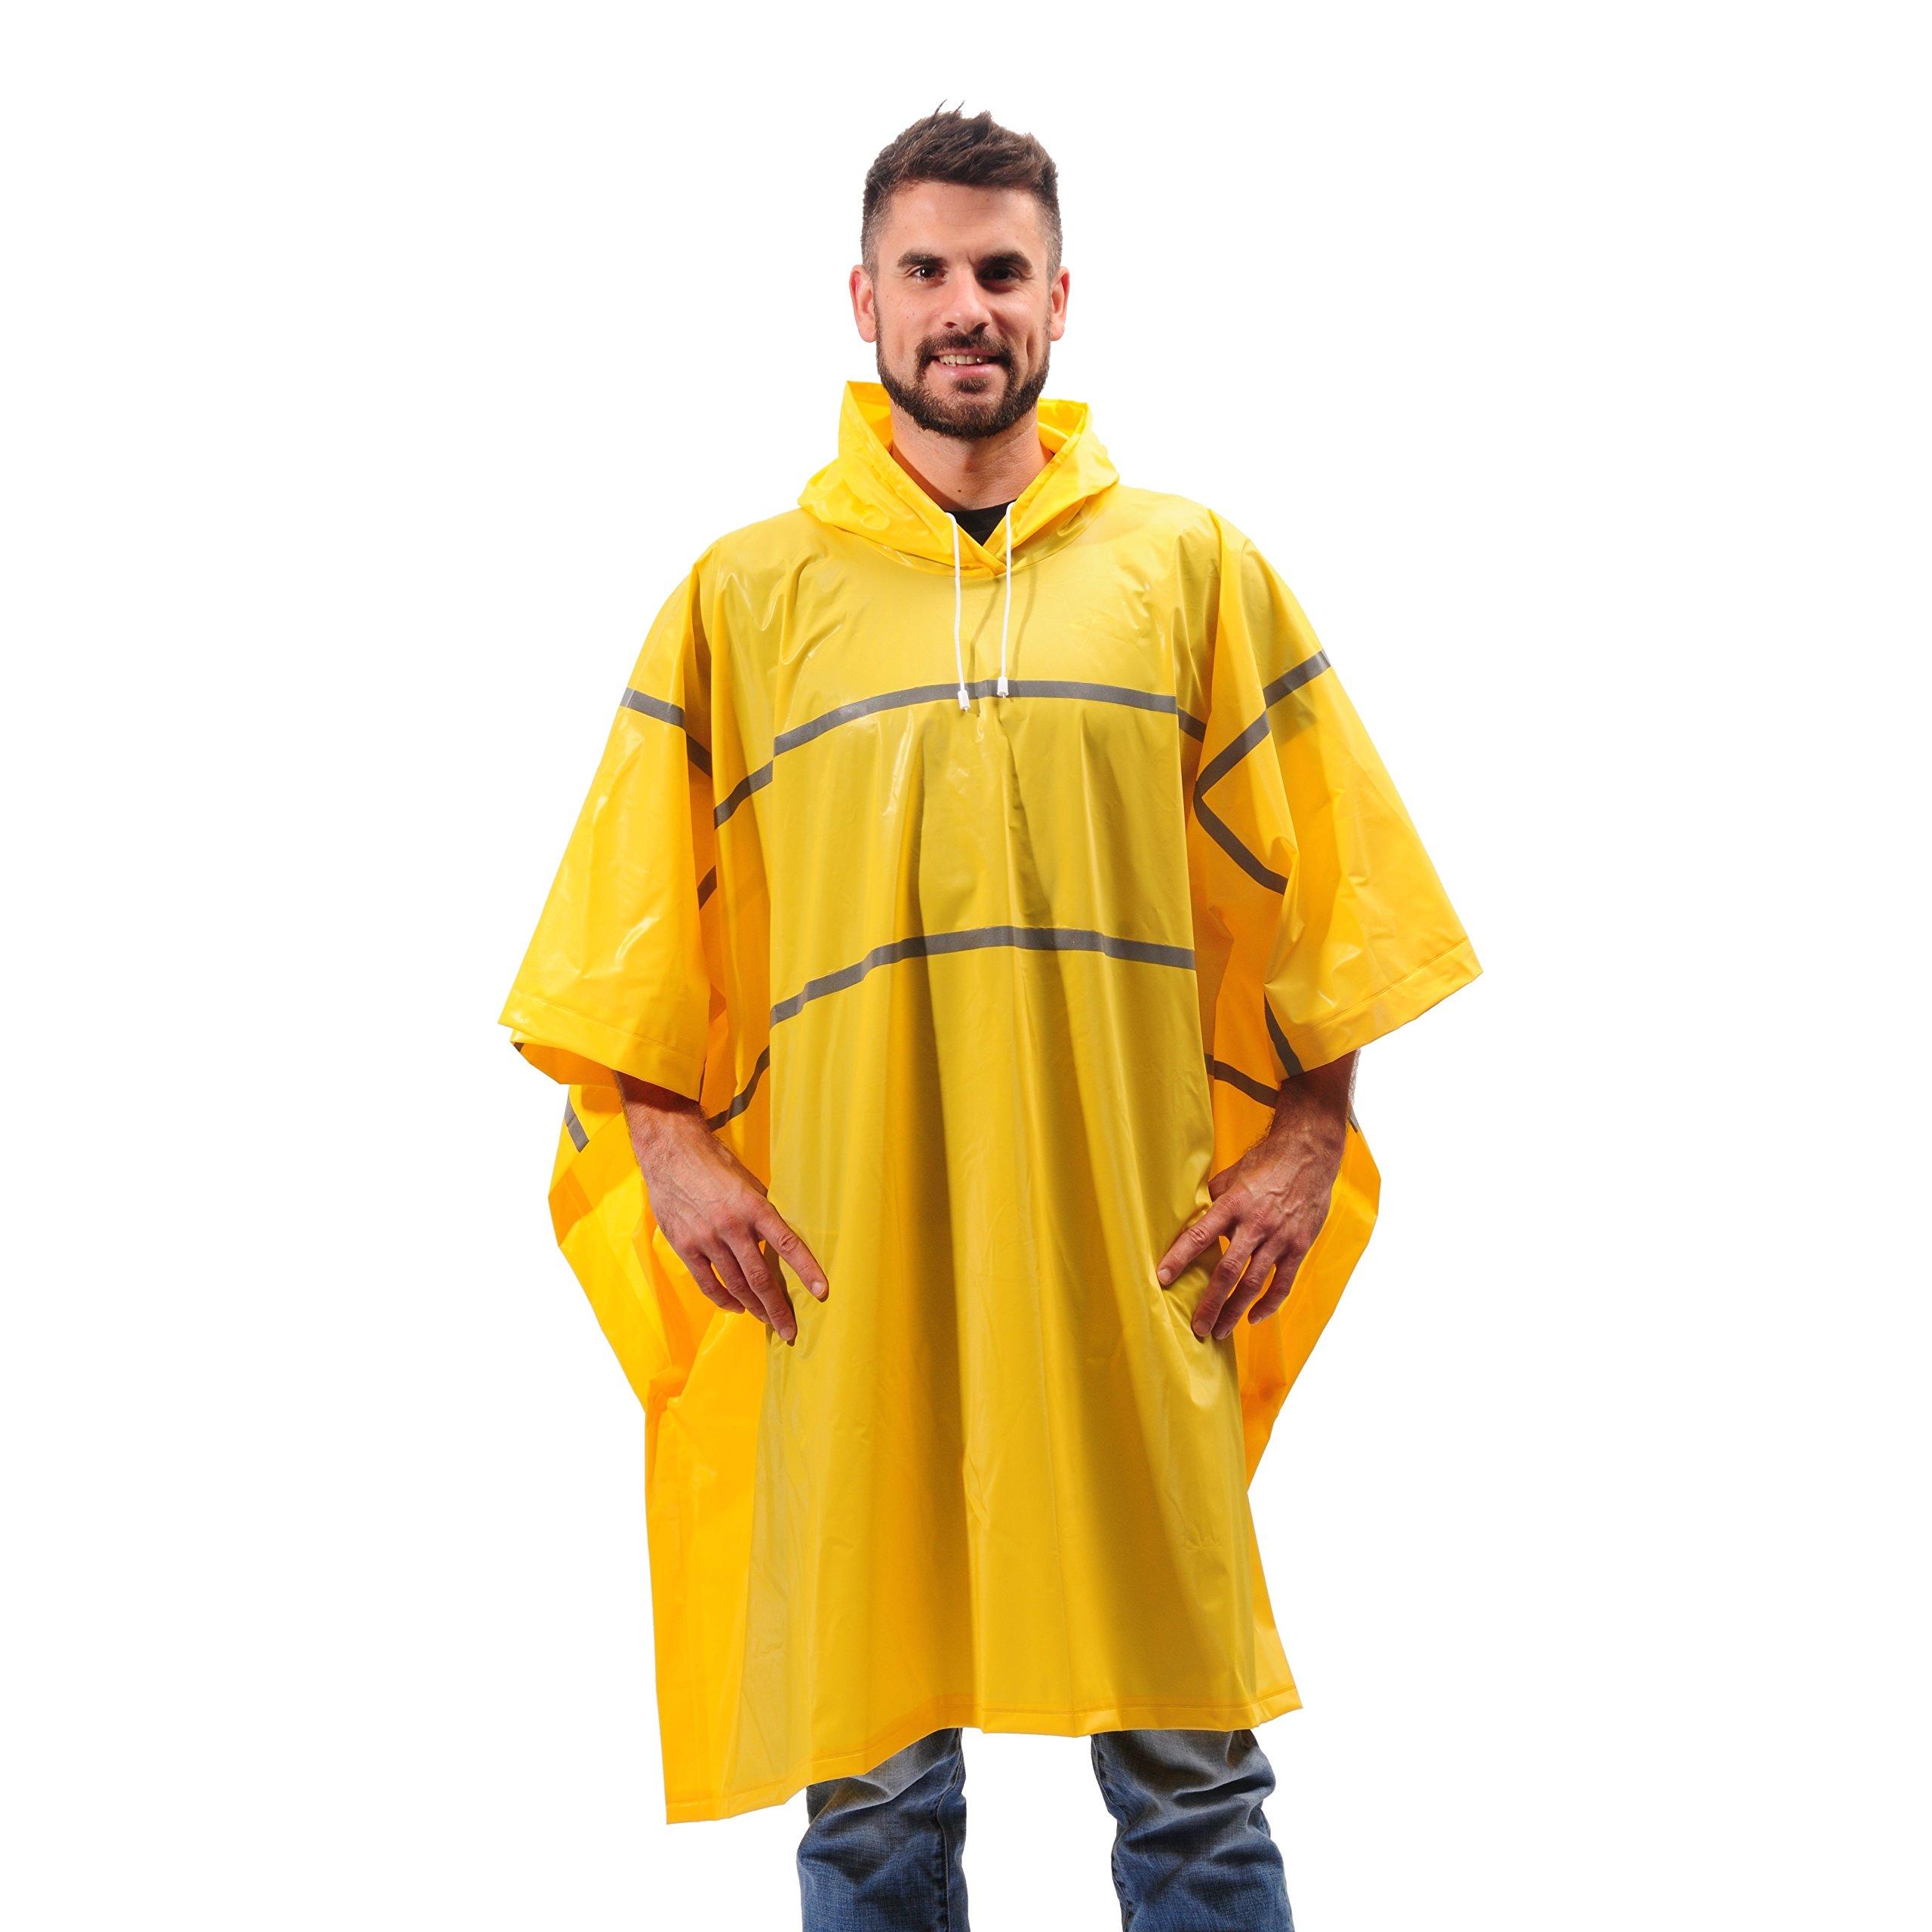 Galeton 12335-YW 12335 Repel Rainwear 0.20 mm PVC Rain Poncho with Reflective Stripes, Yellow, One Size